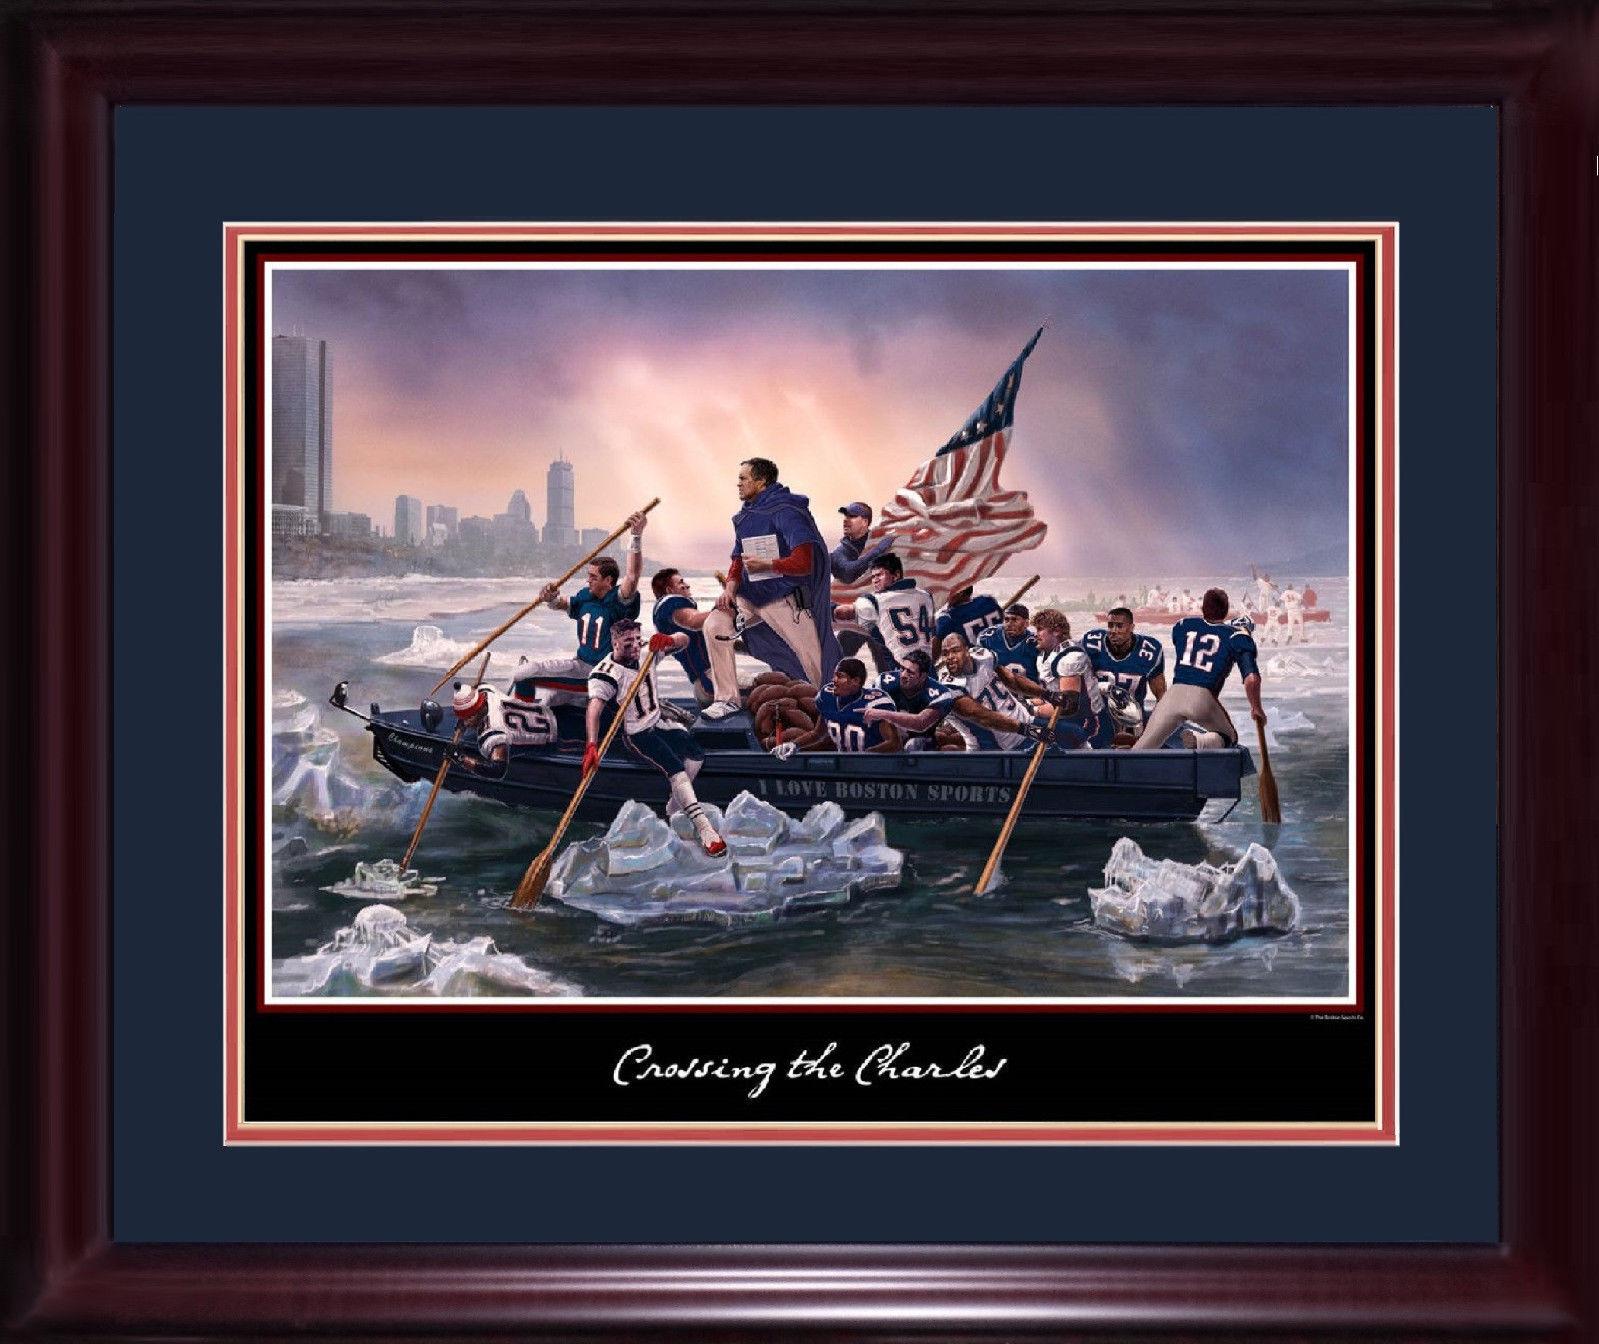 Patriots Boston crossing the charles 16×20 litho photo framed Tom Brady SB mvp